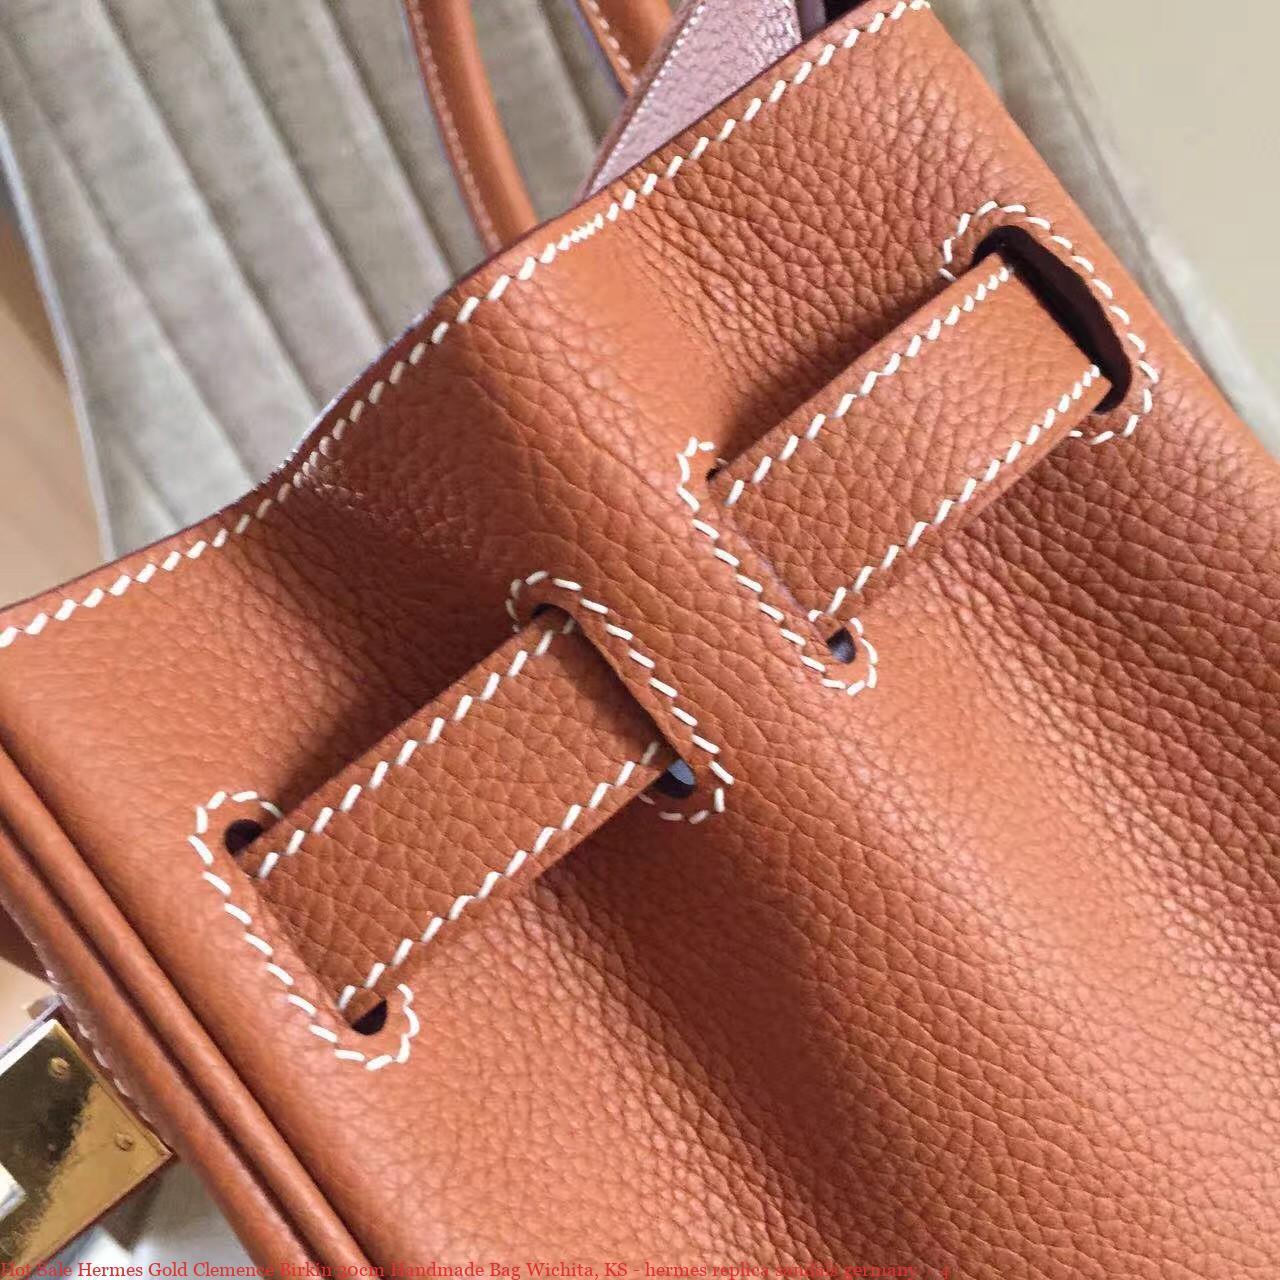 f2b6a243614 Hot Sale Hermes Gold Clemence Birkin 30cm Handmade Bag Wichita, KS ...